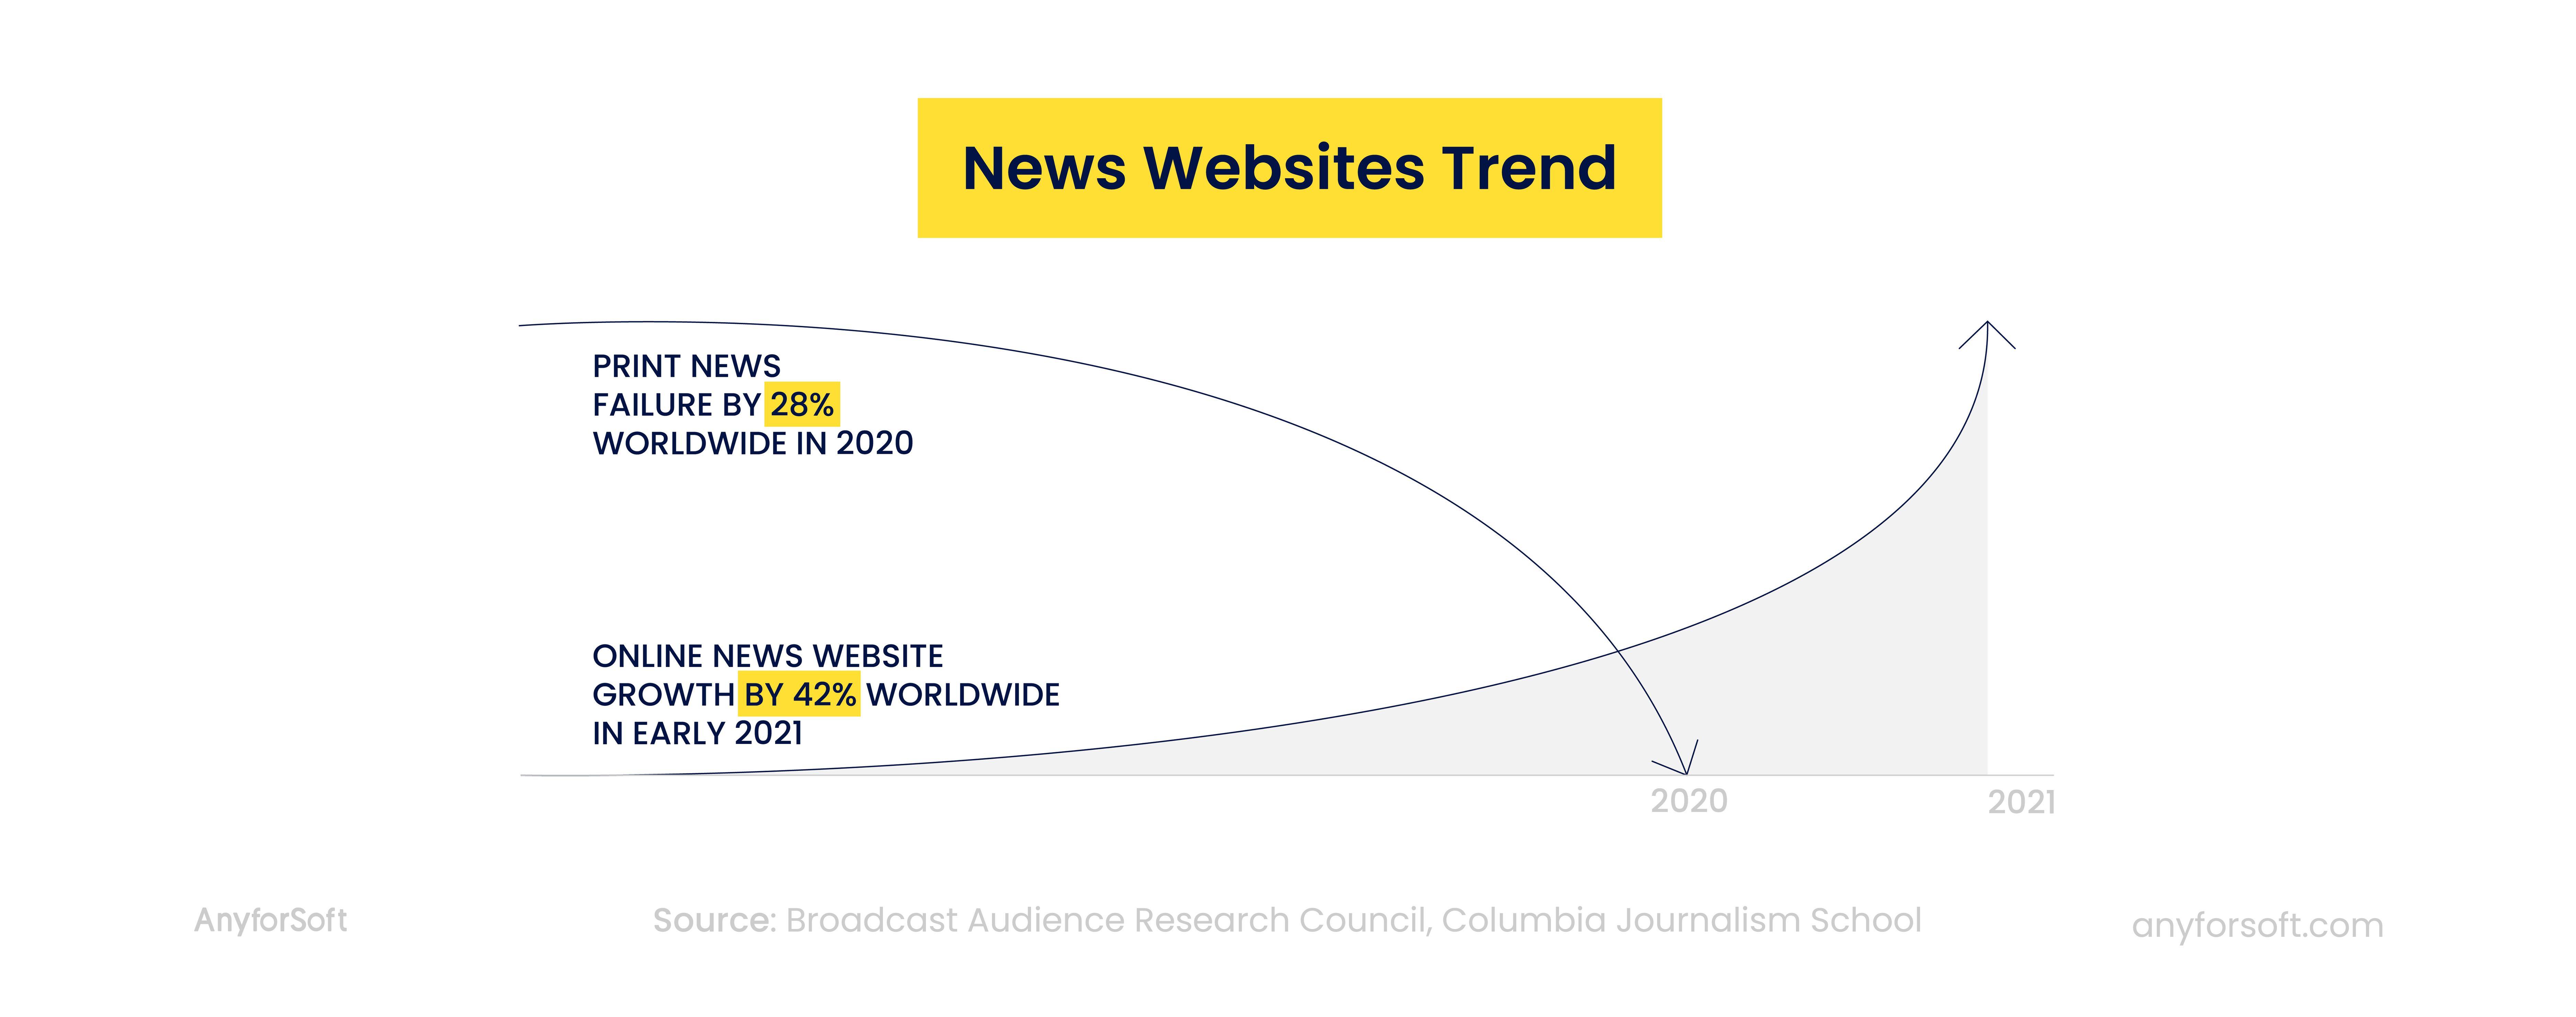 online vs print news popularity growth